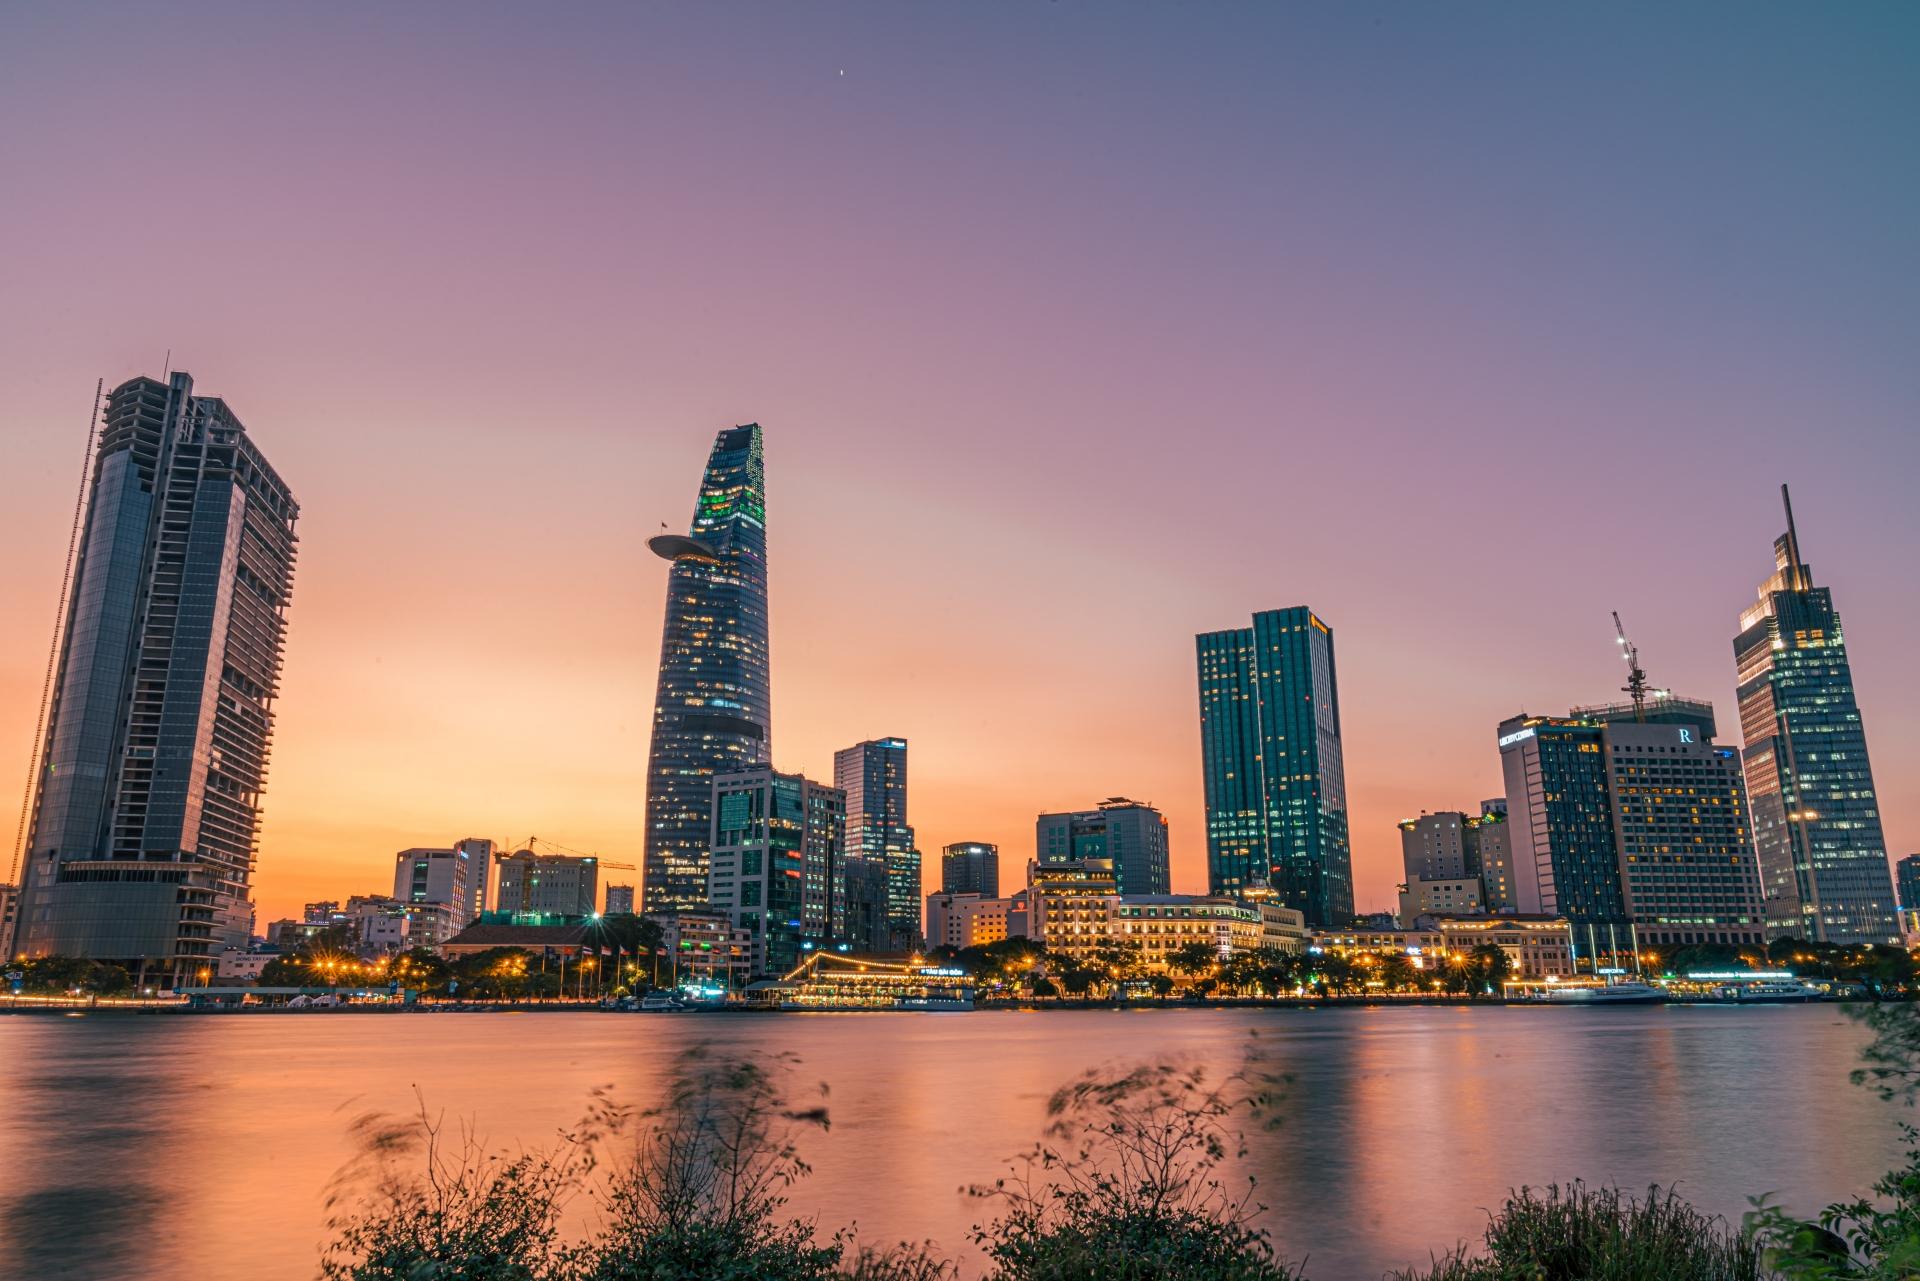 S&P Global raises Vietnam outlook to positive